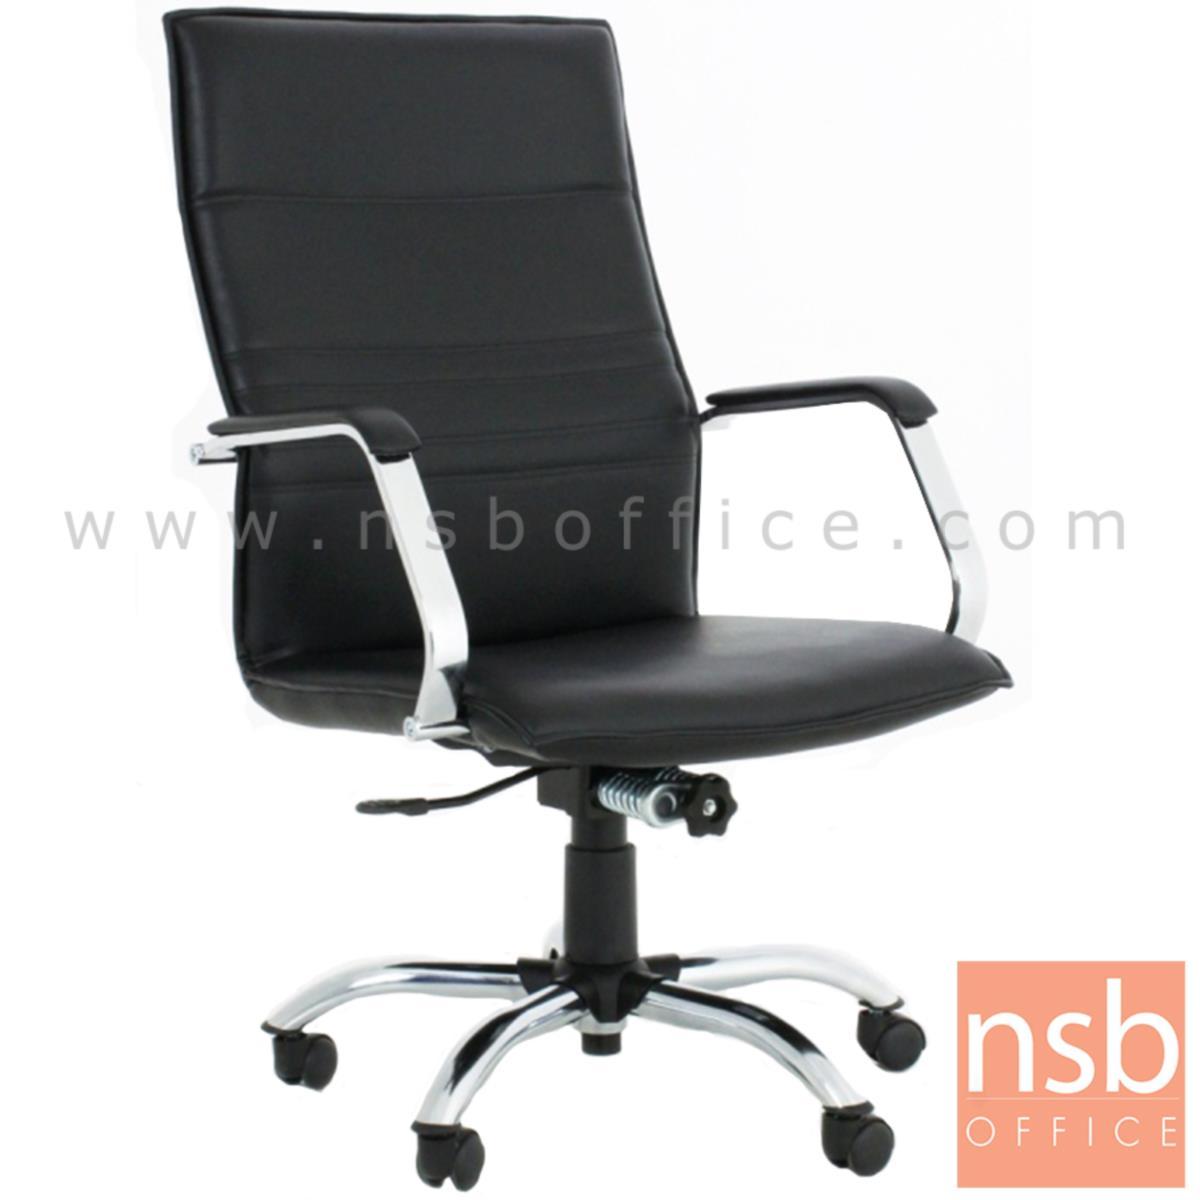 B28A021:เก้าอี้สำนักงาน รุ่น Lada (ลาด้า)  โช๊คแก๊ส มีก้อนโยก ขาเหล็กชุบโครเมี่ยม